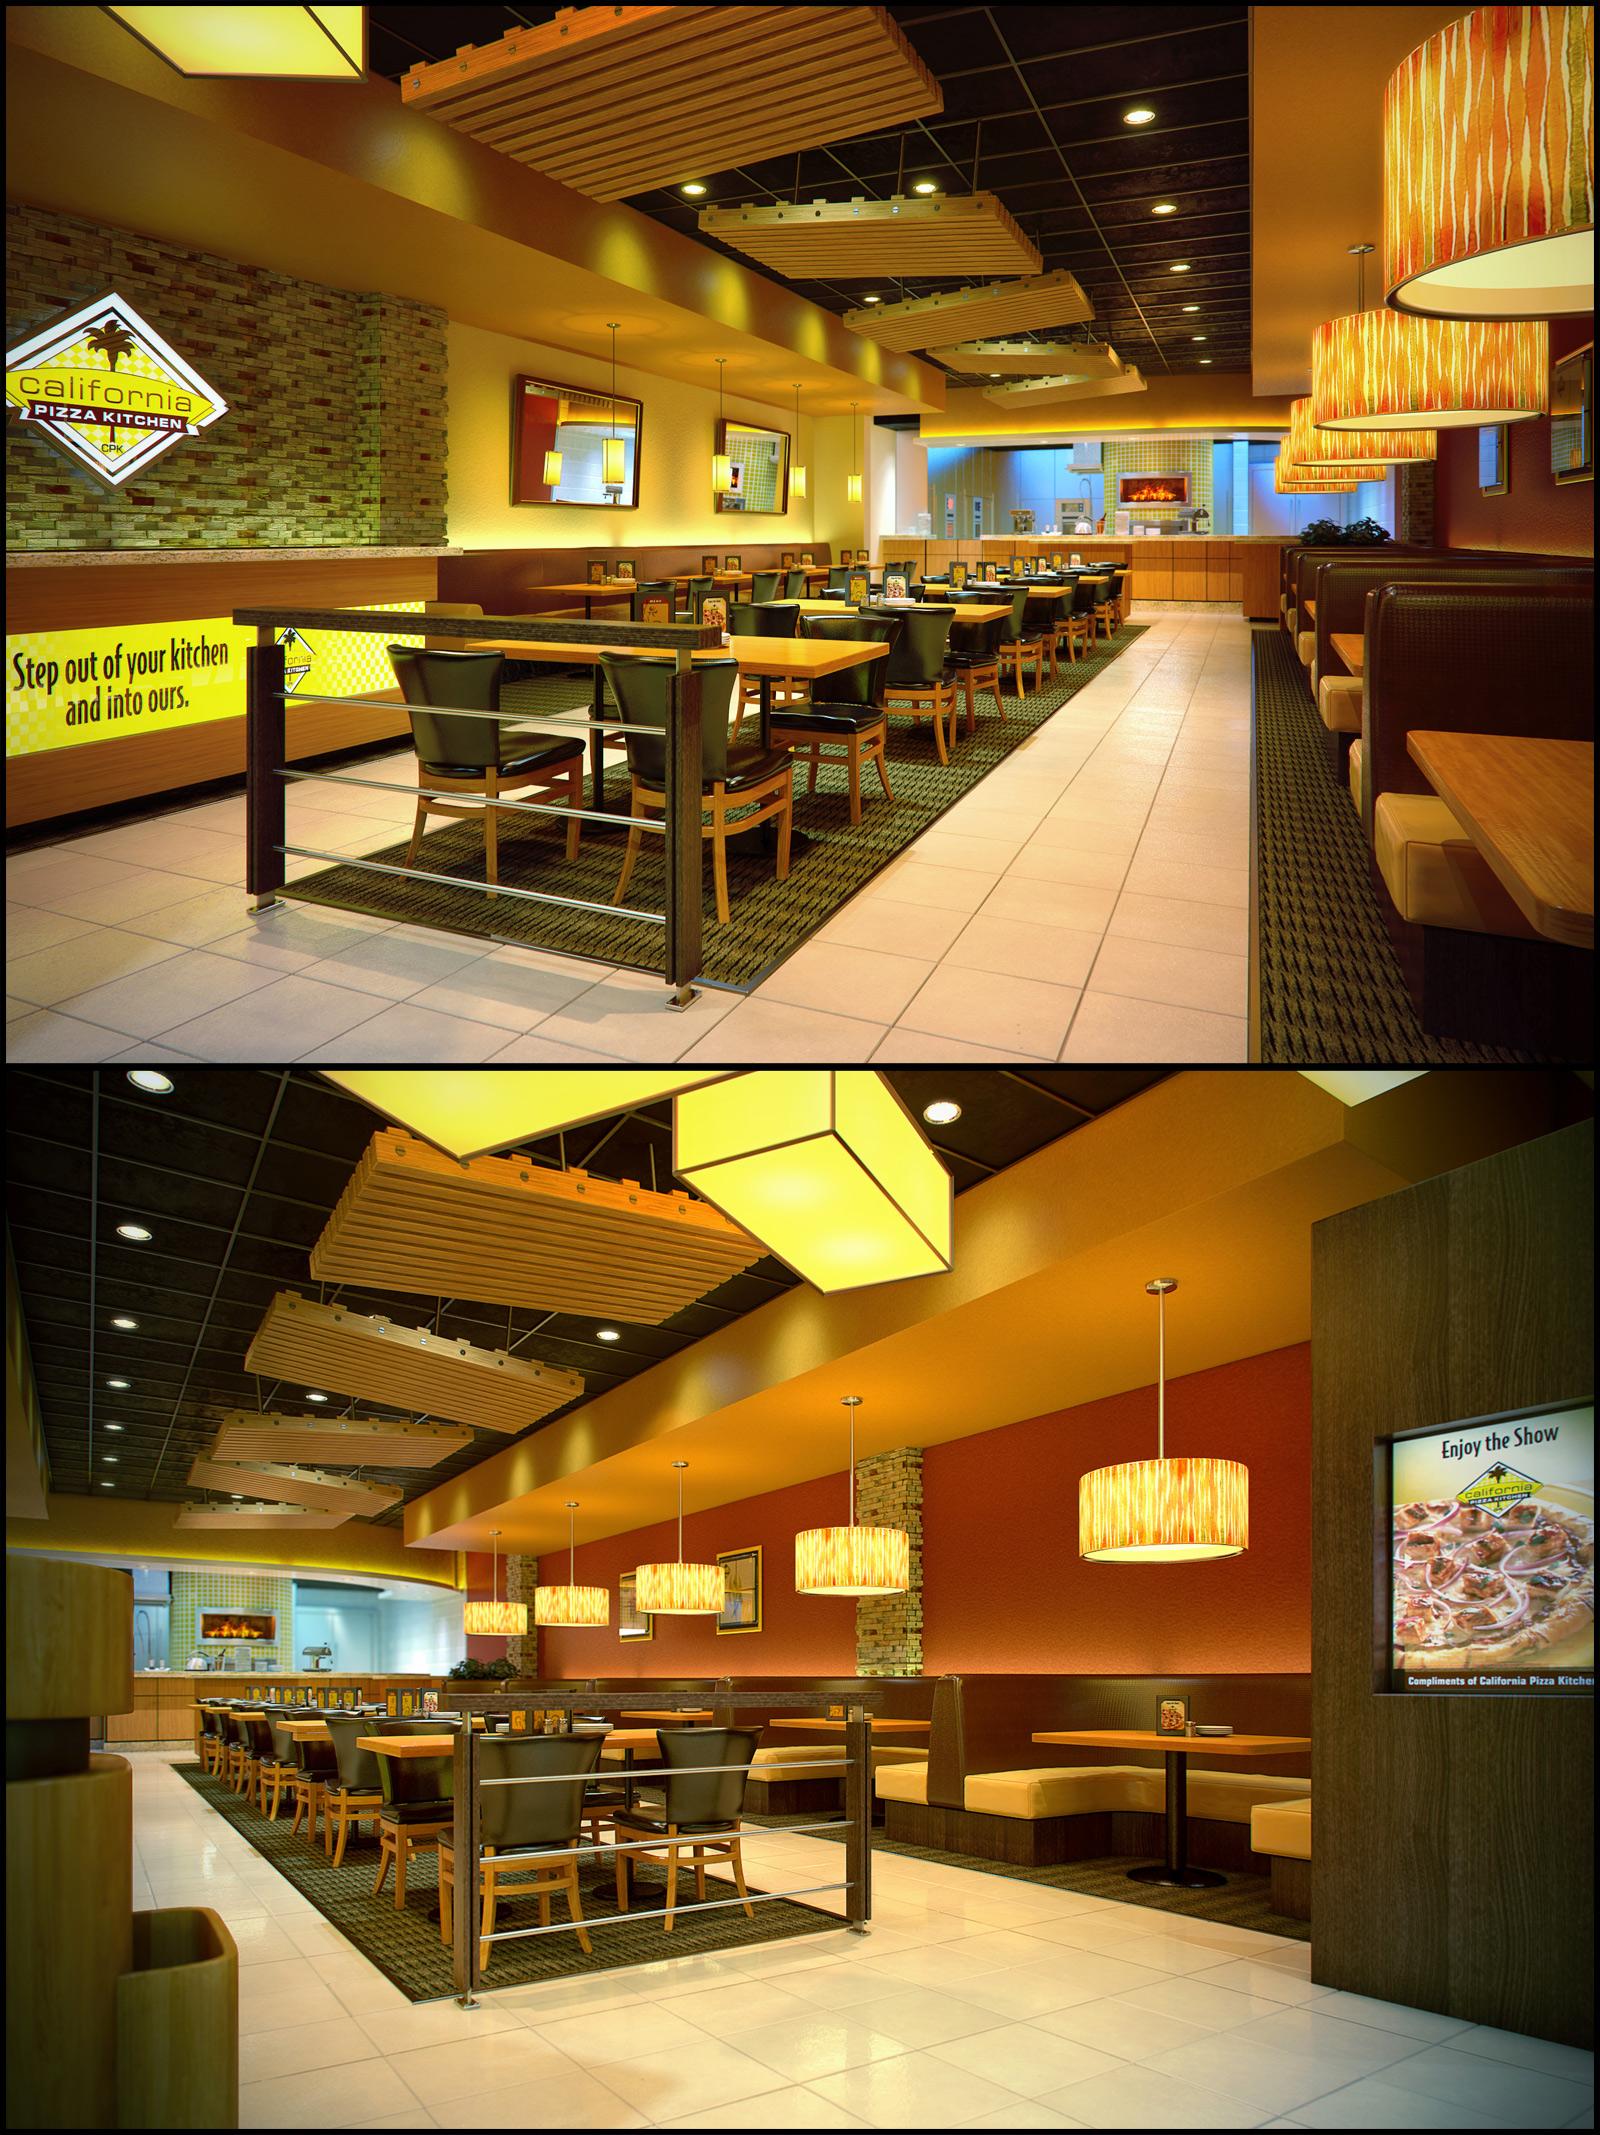 Cpk Interior By Kulayan3d On Deviantart